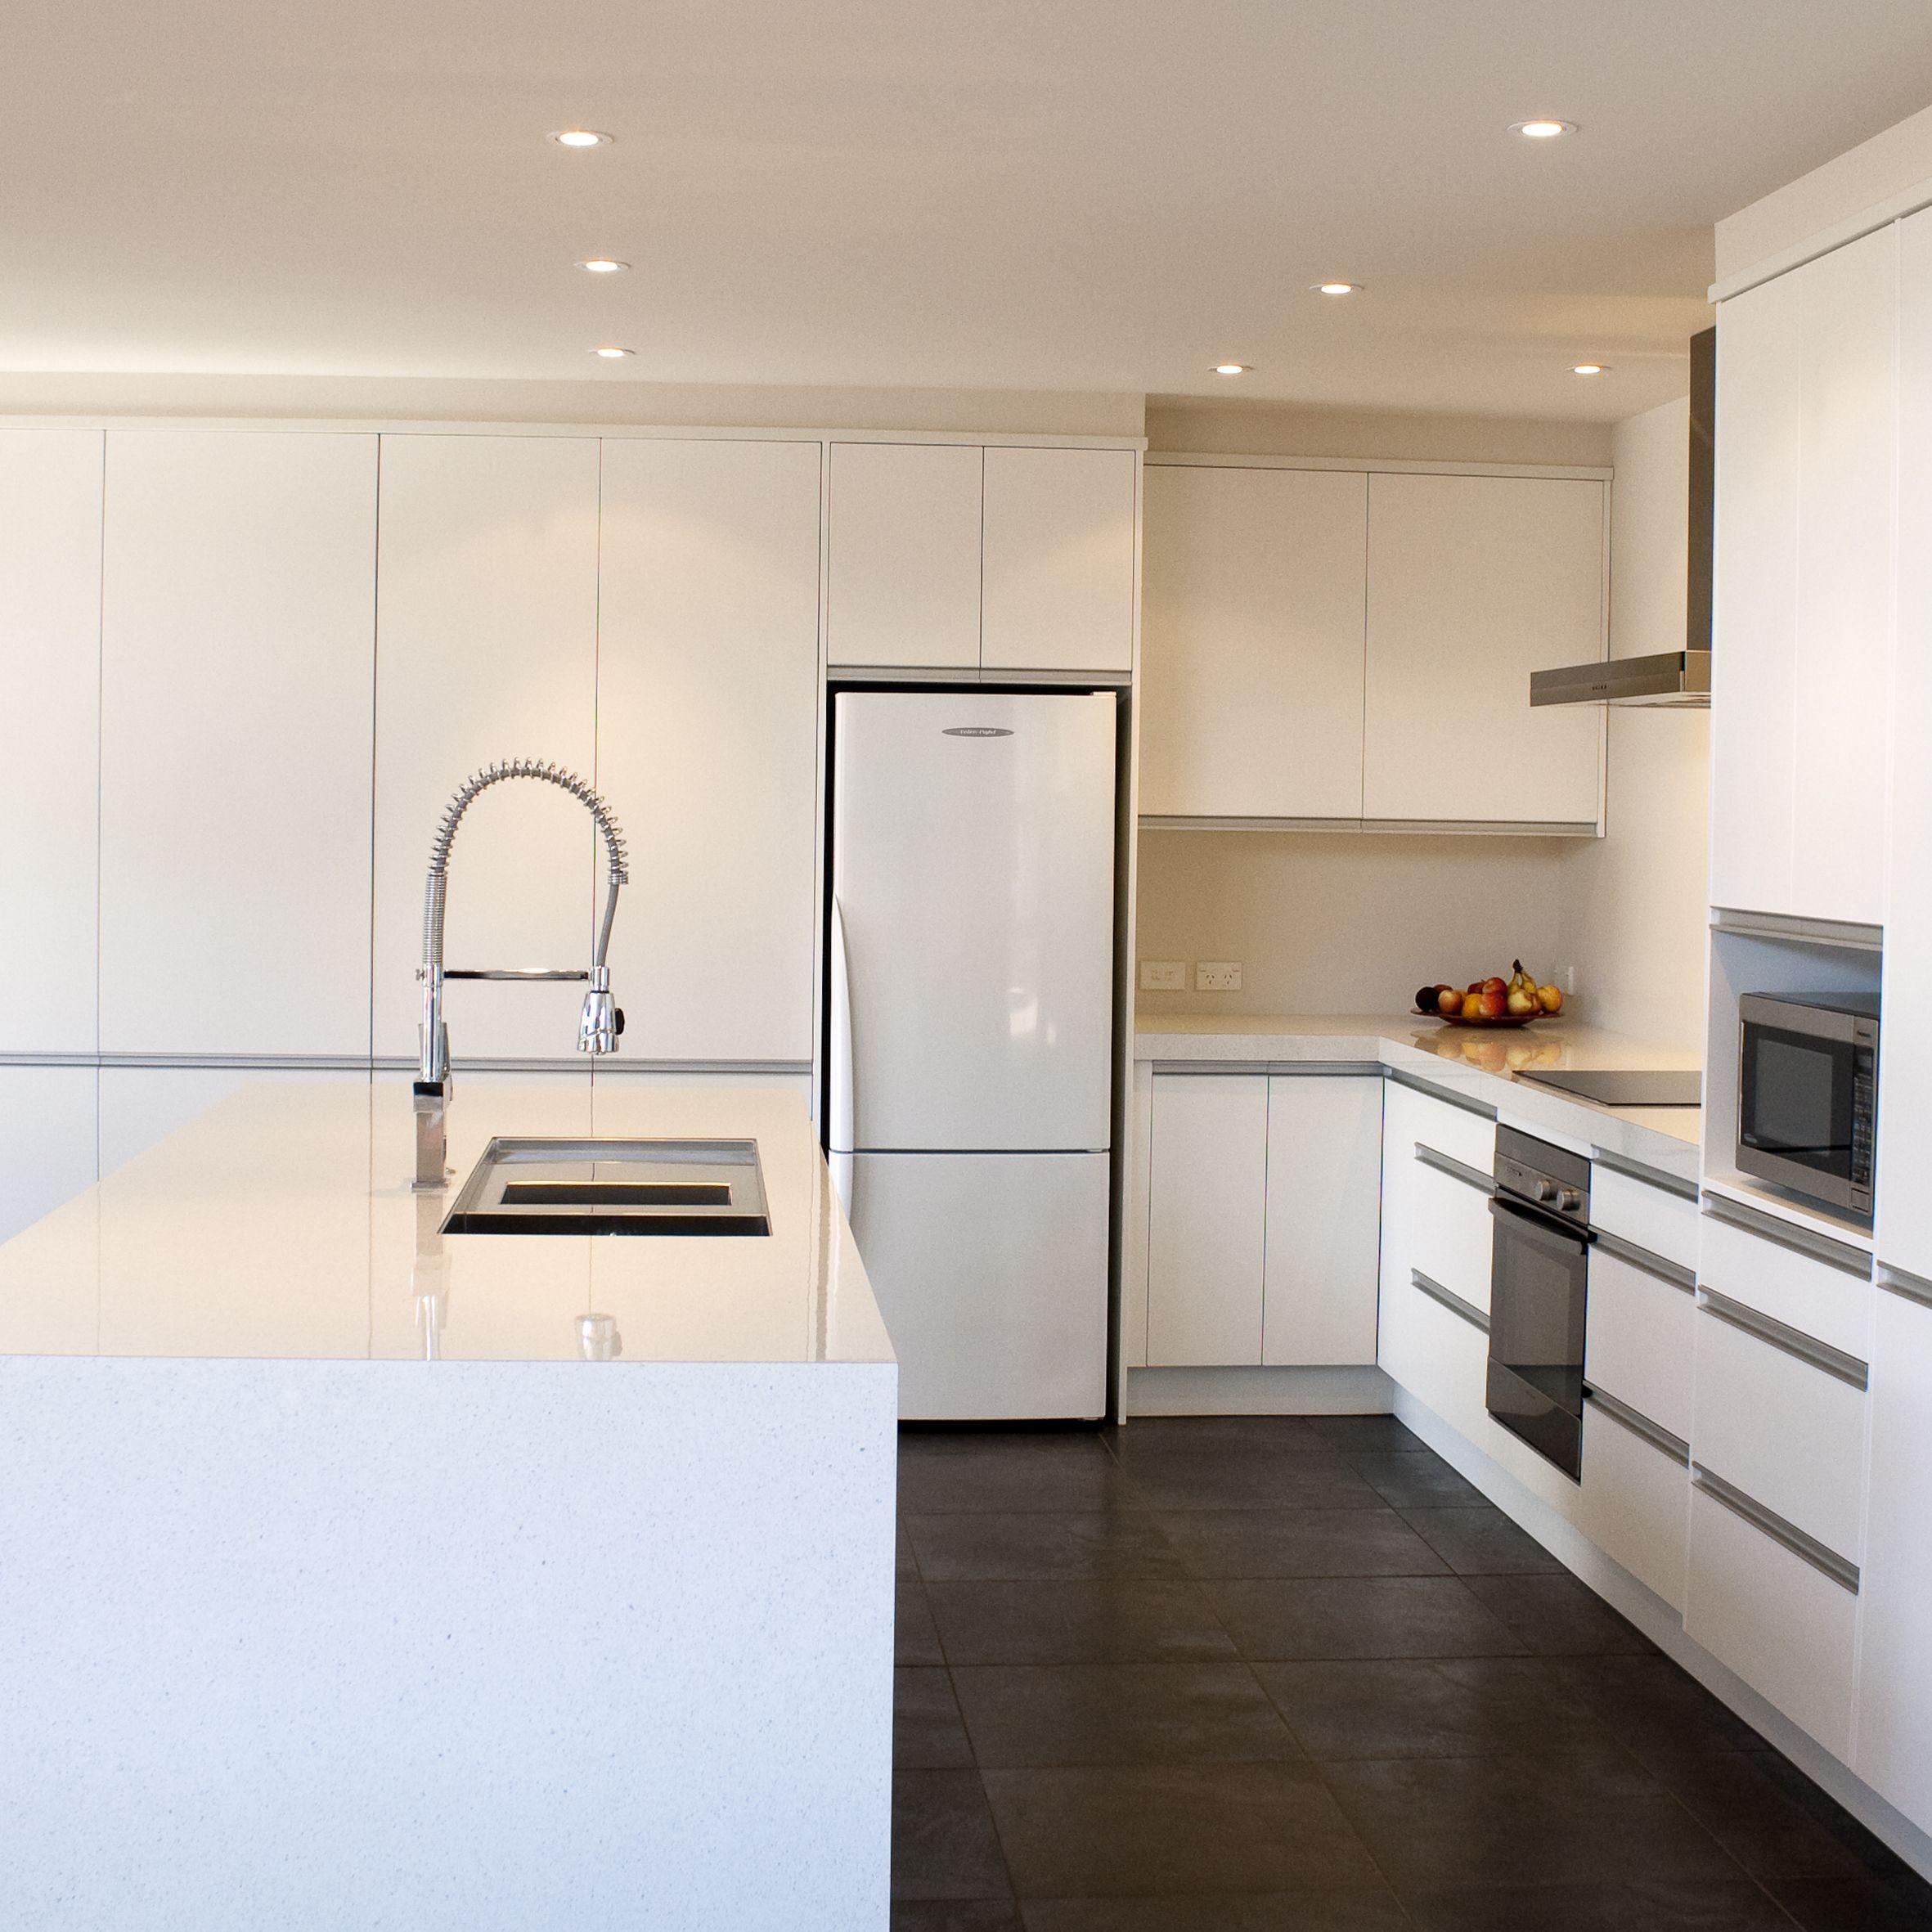 Melteca Kitchen With Long Aluminium Handles